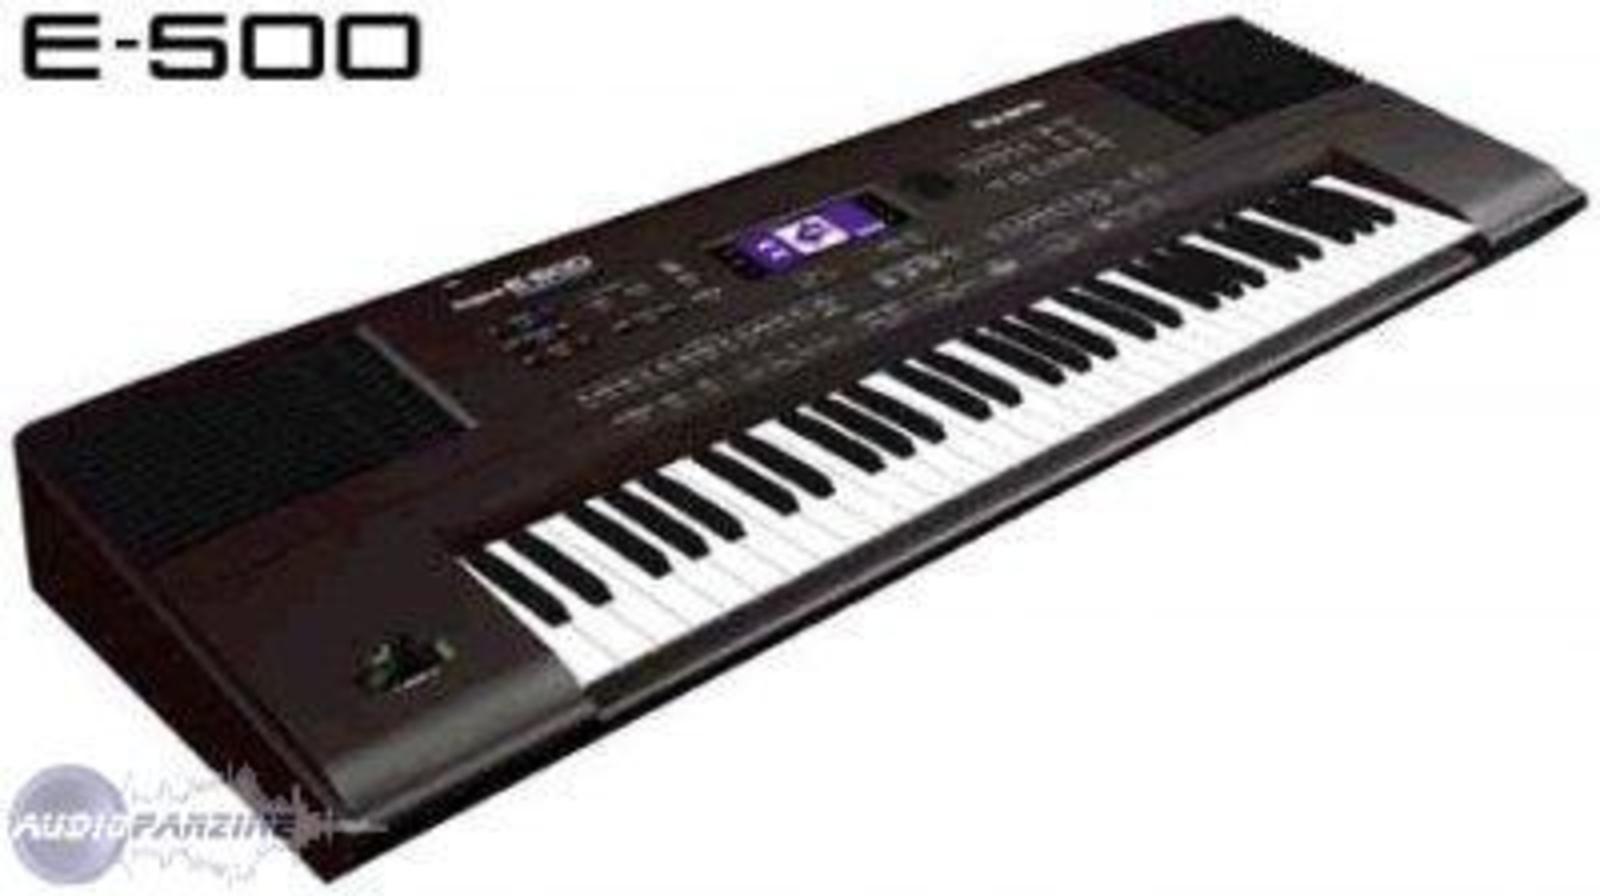 Roland E-500 image (#37042) - Audiofanzine